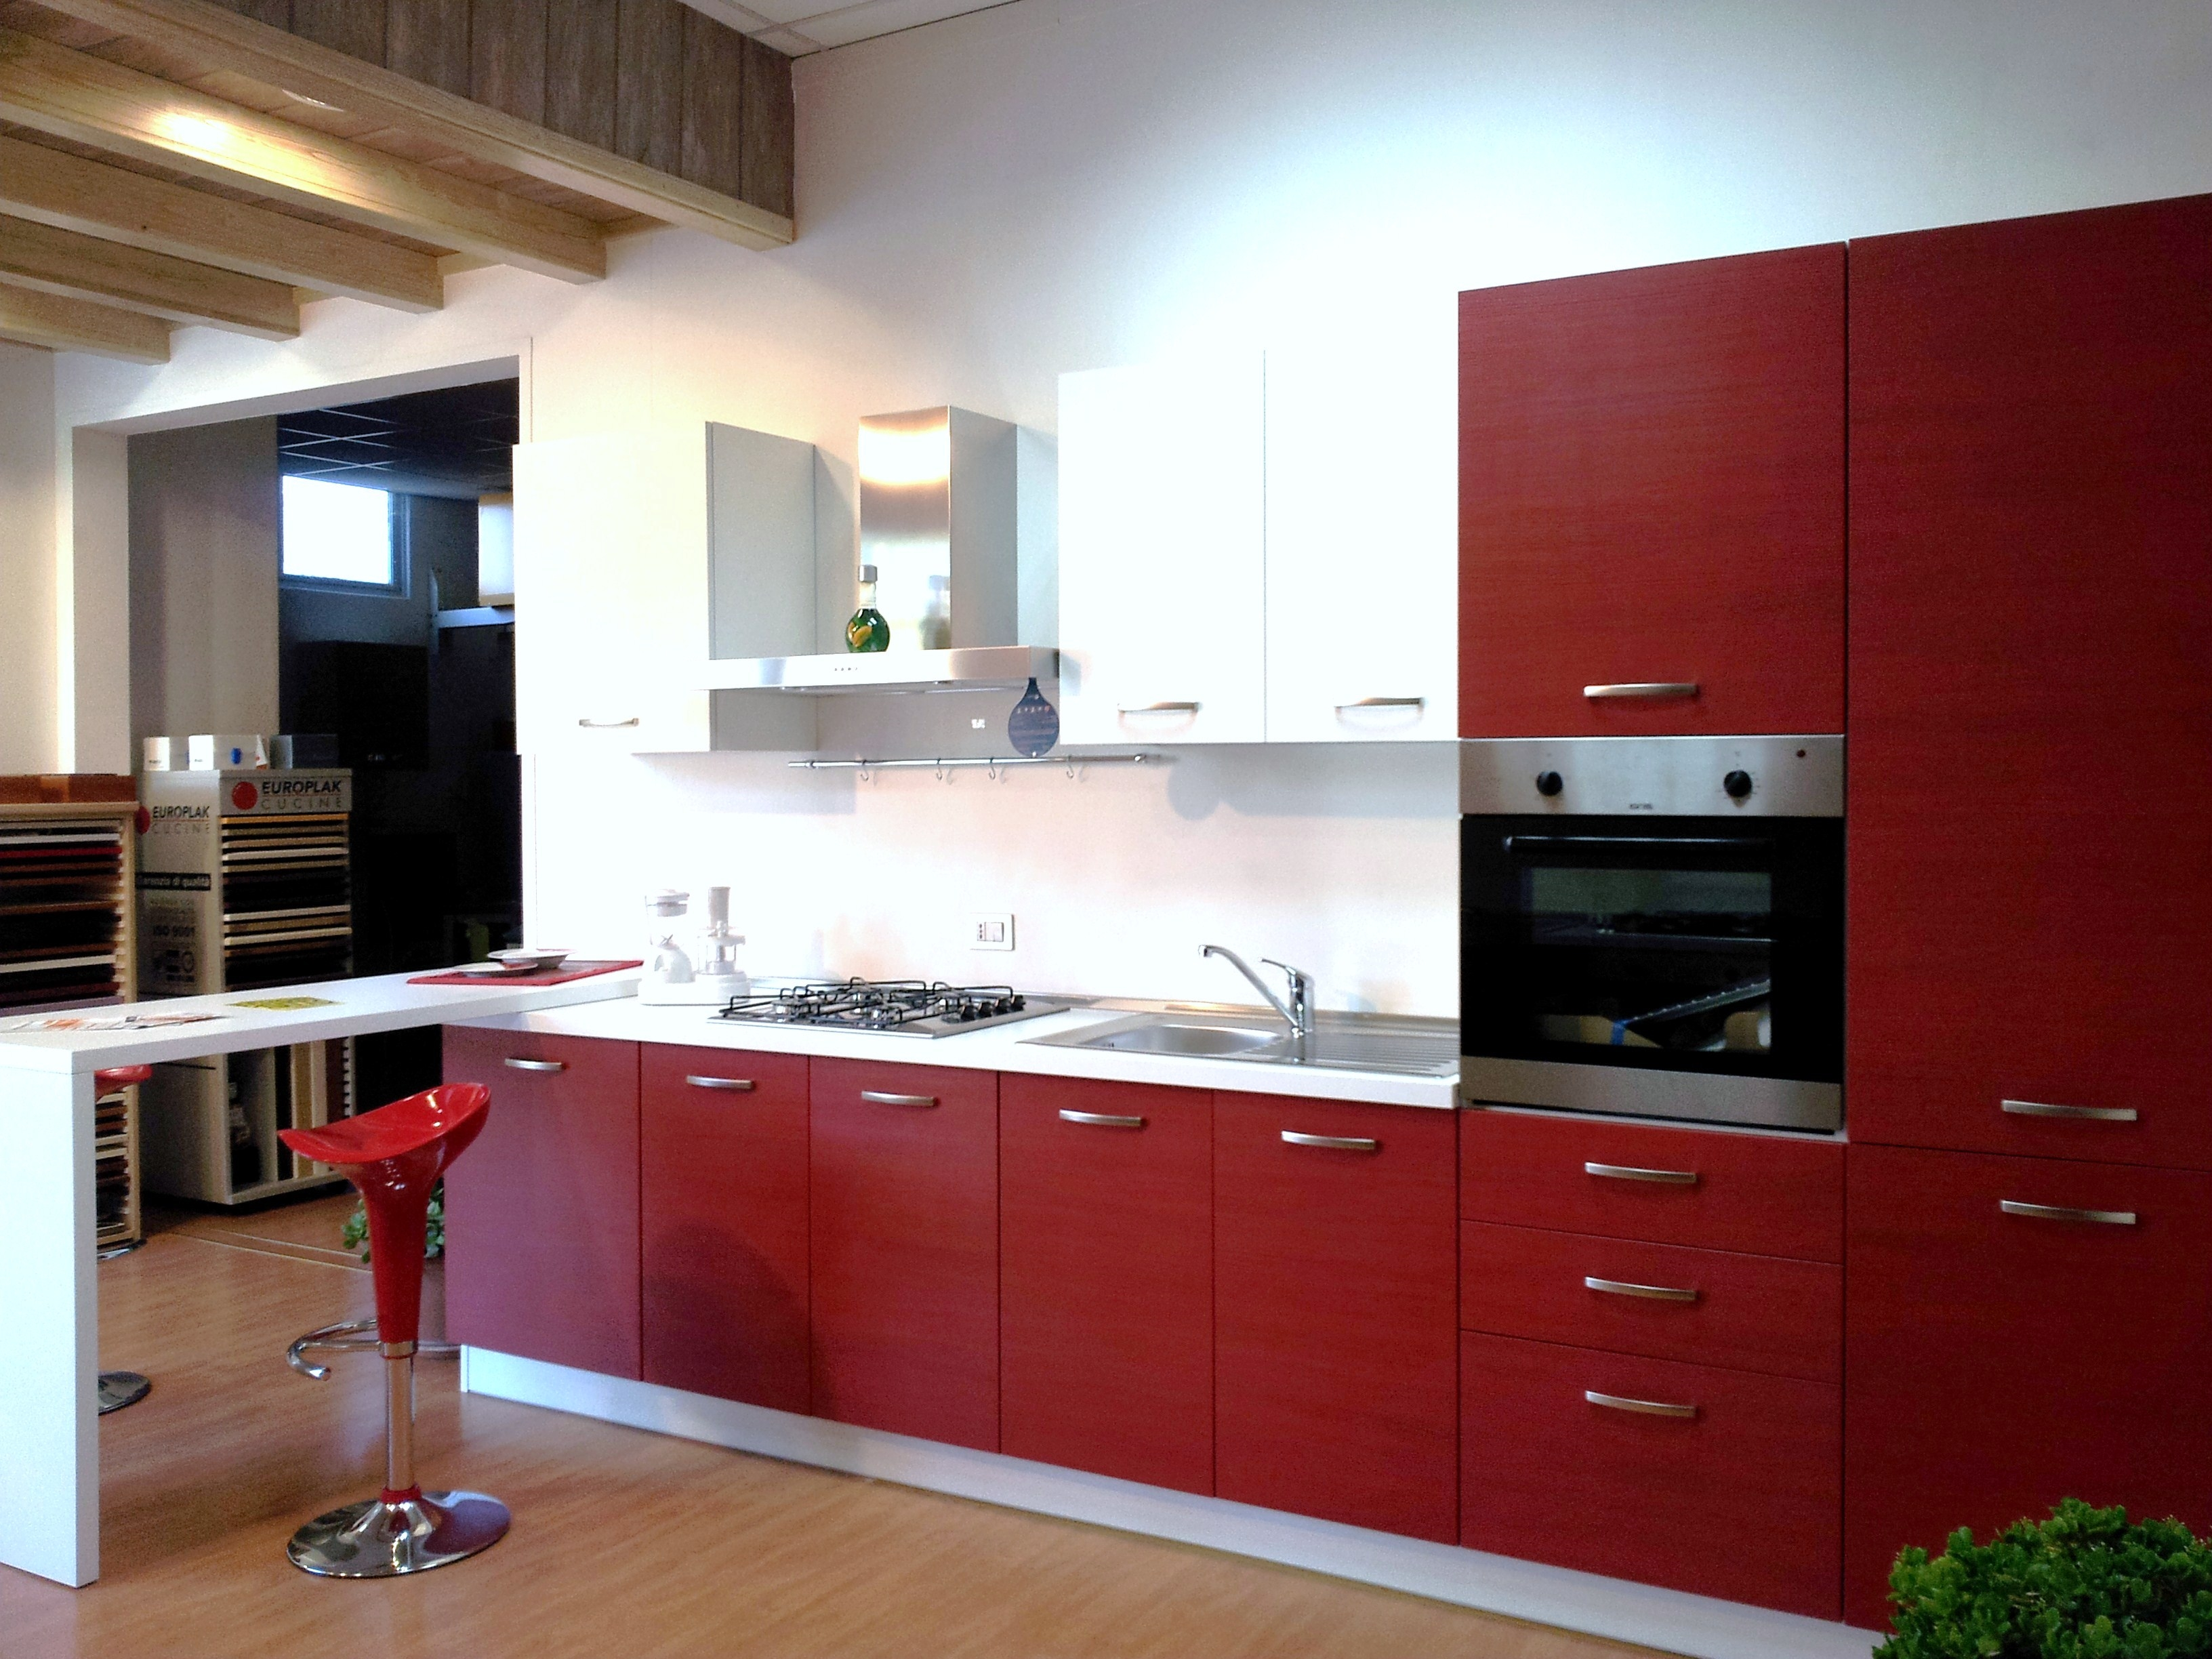 Cucina moderna con penisola cucine a prezzi scontati for Cucine moderne con penisola